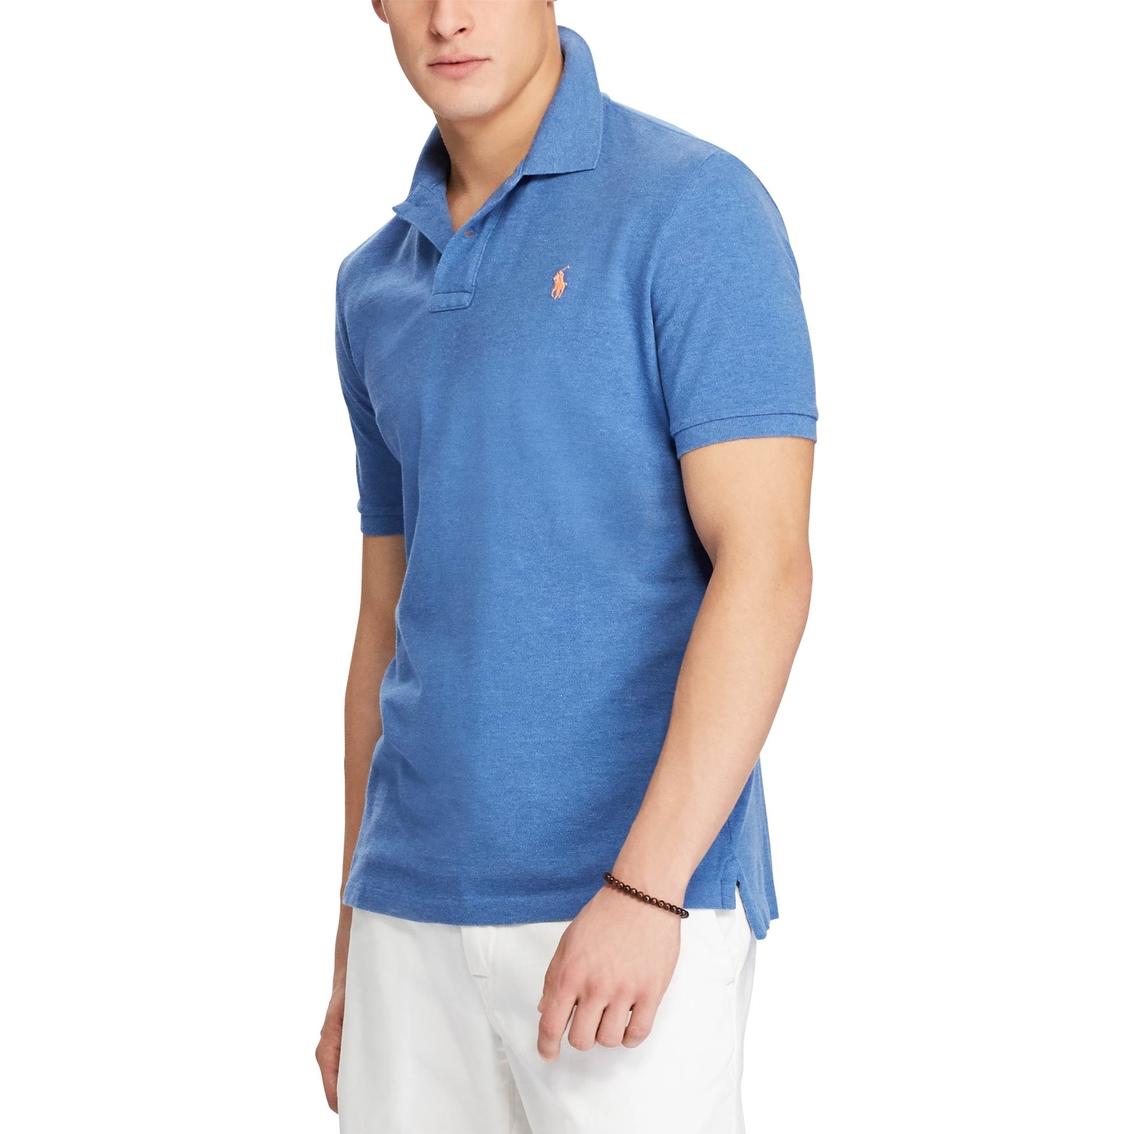 f276b5f97 Polo Ralph Lauren Classic Fit Mesh Polo Shirt